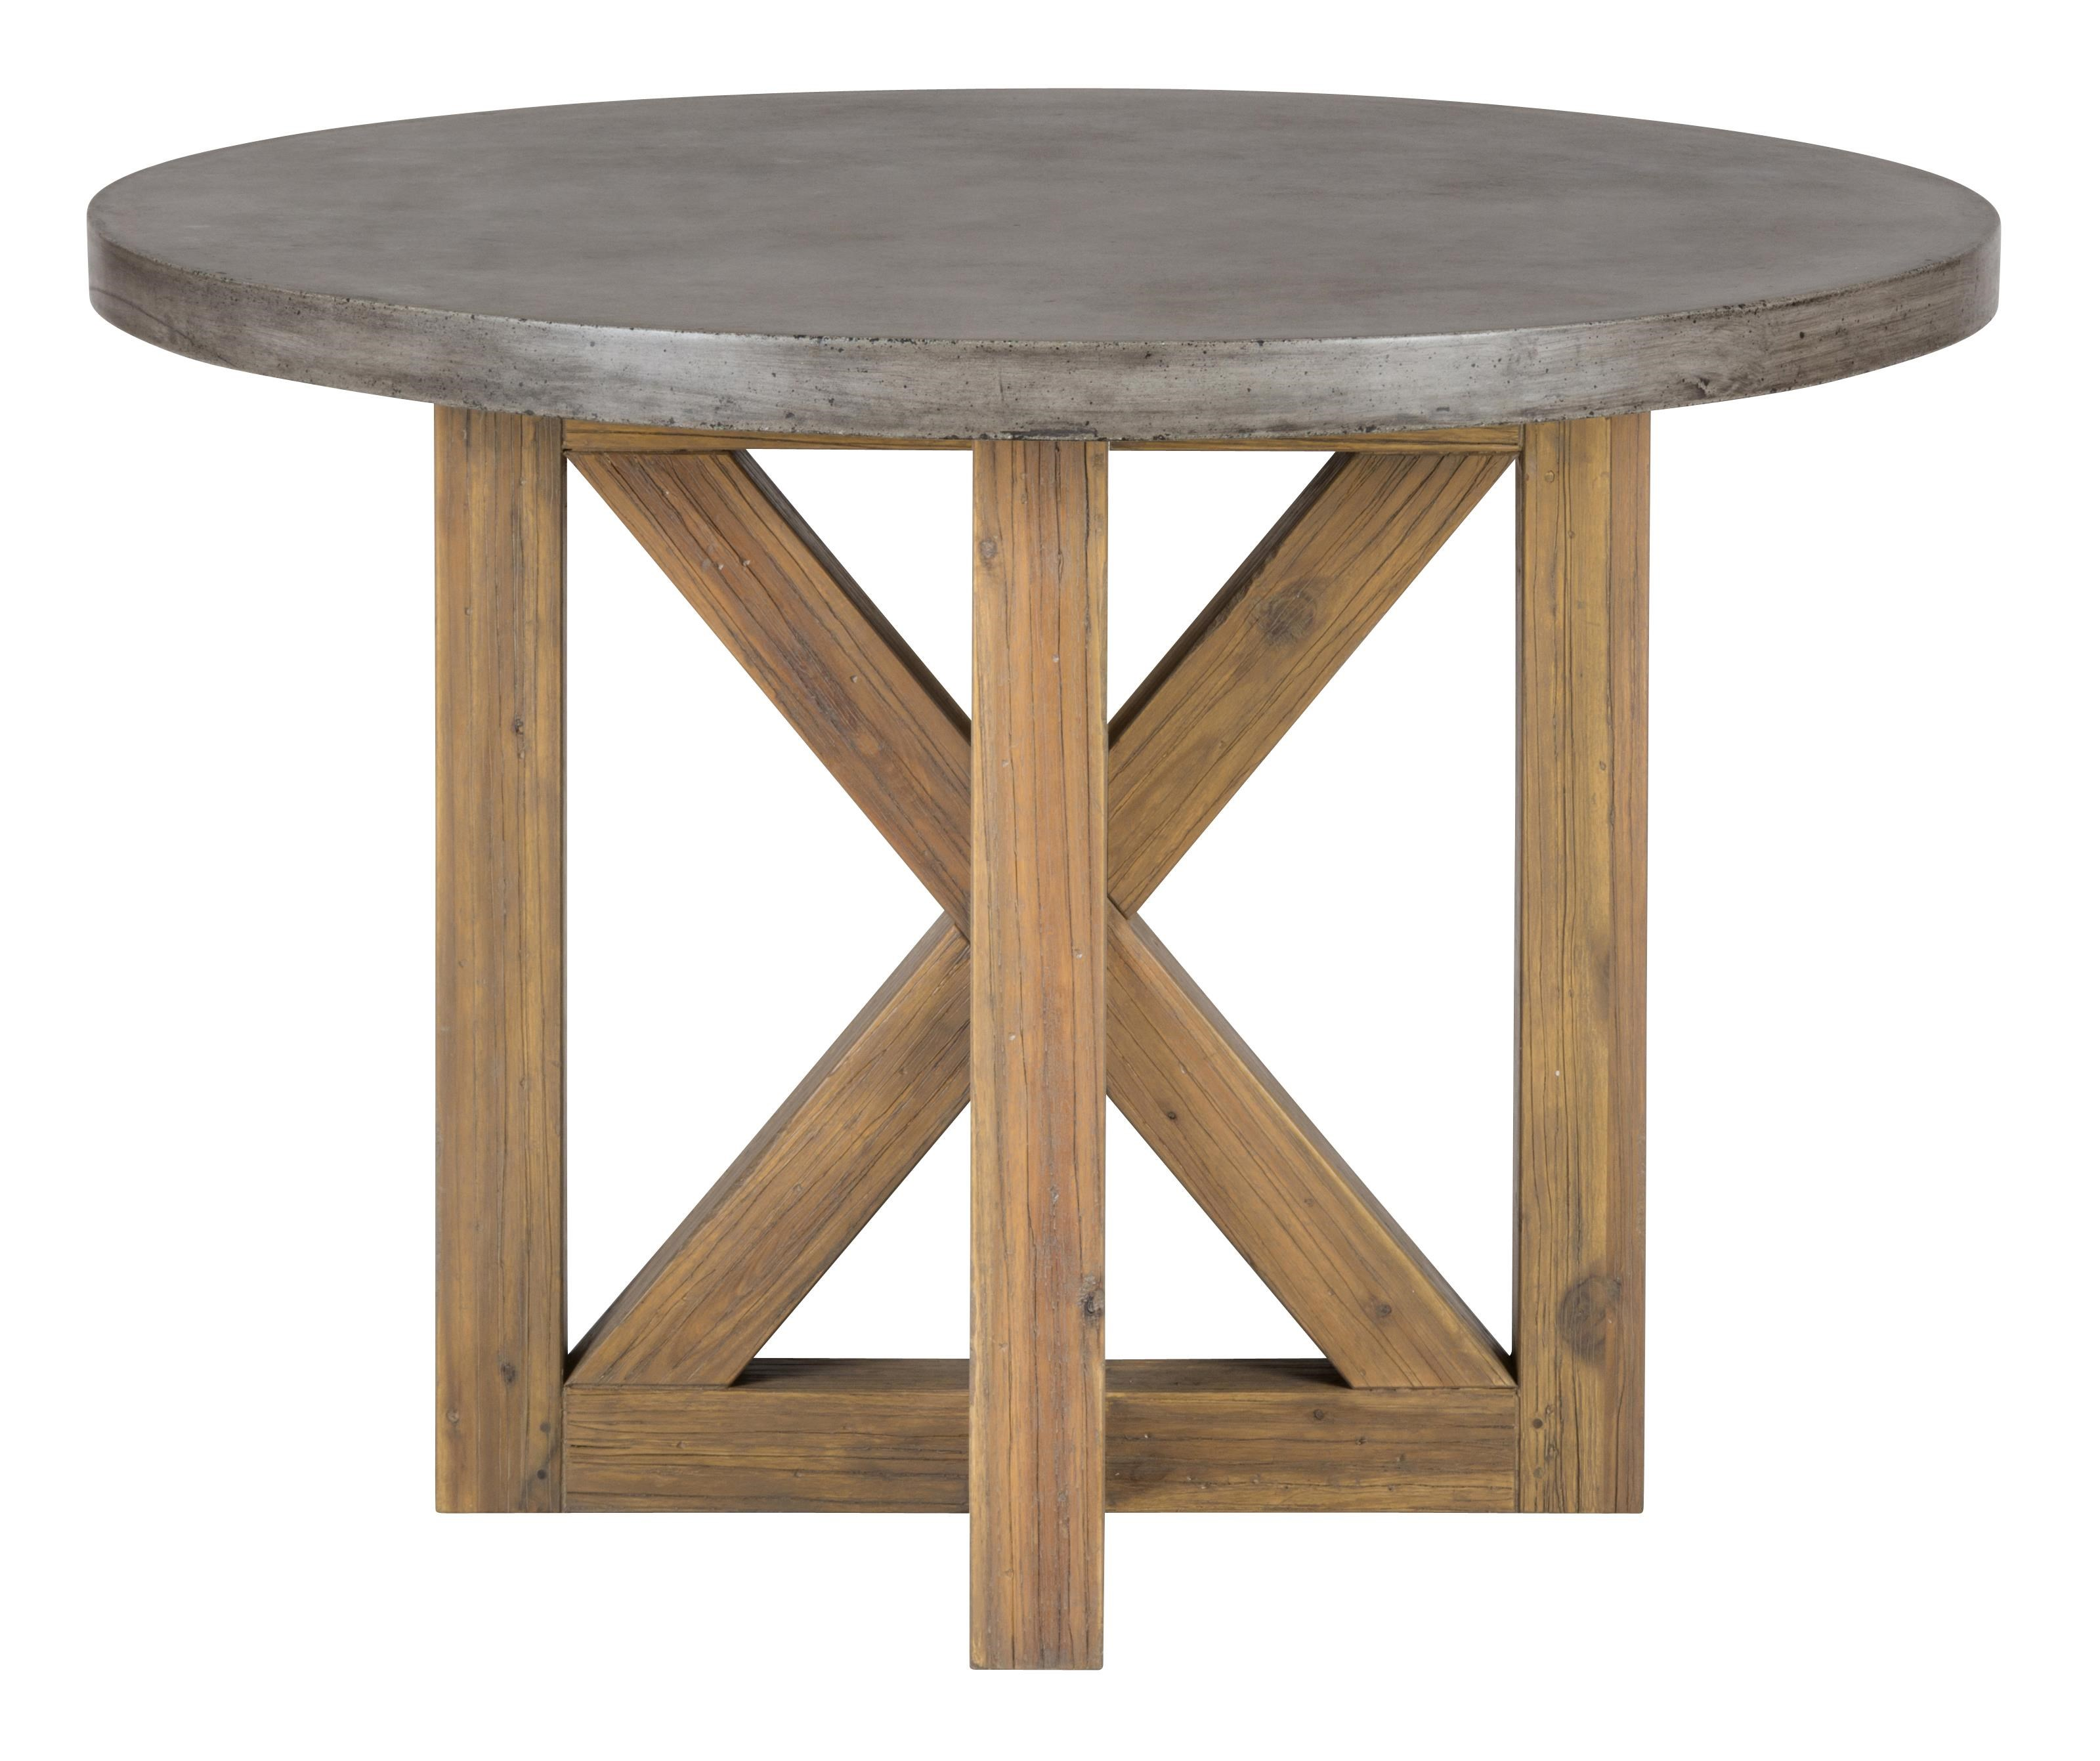 Jofran Boulder Ridge Concrete Dining Table  Round   Virginia Furniture  Market   Kitchen Table